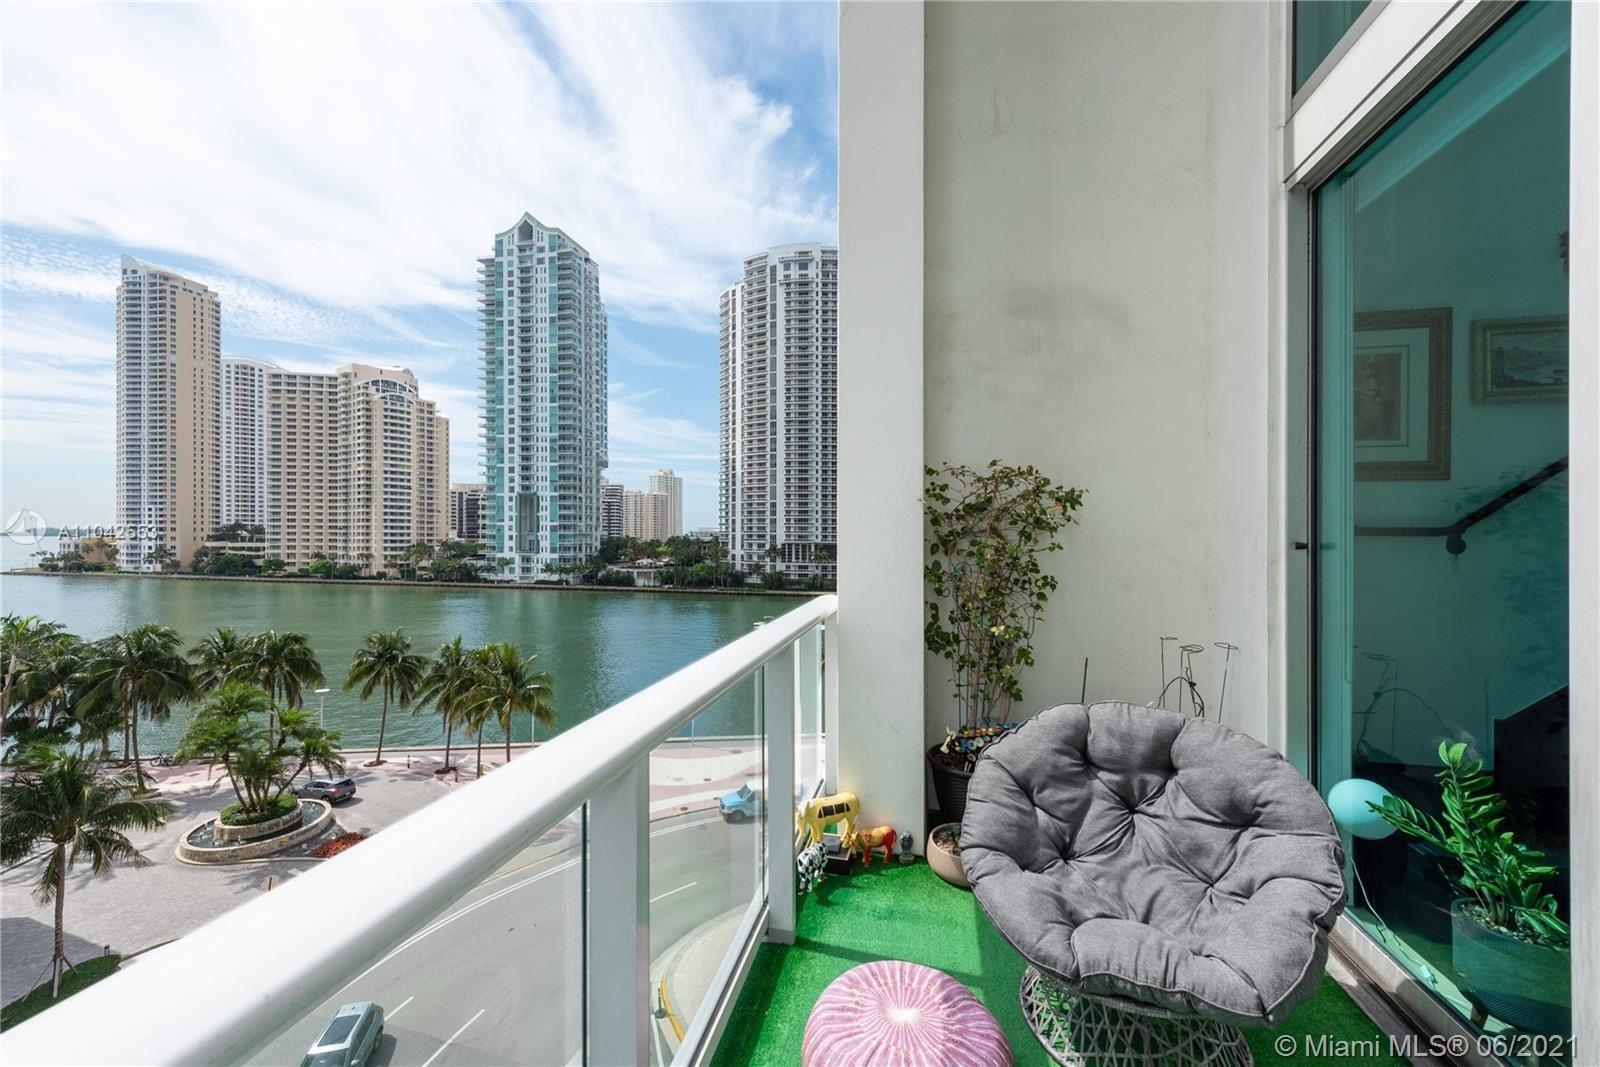 300 S Biscayne Blvd #L-624, Miami, FL 33131 - #: A11042553